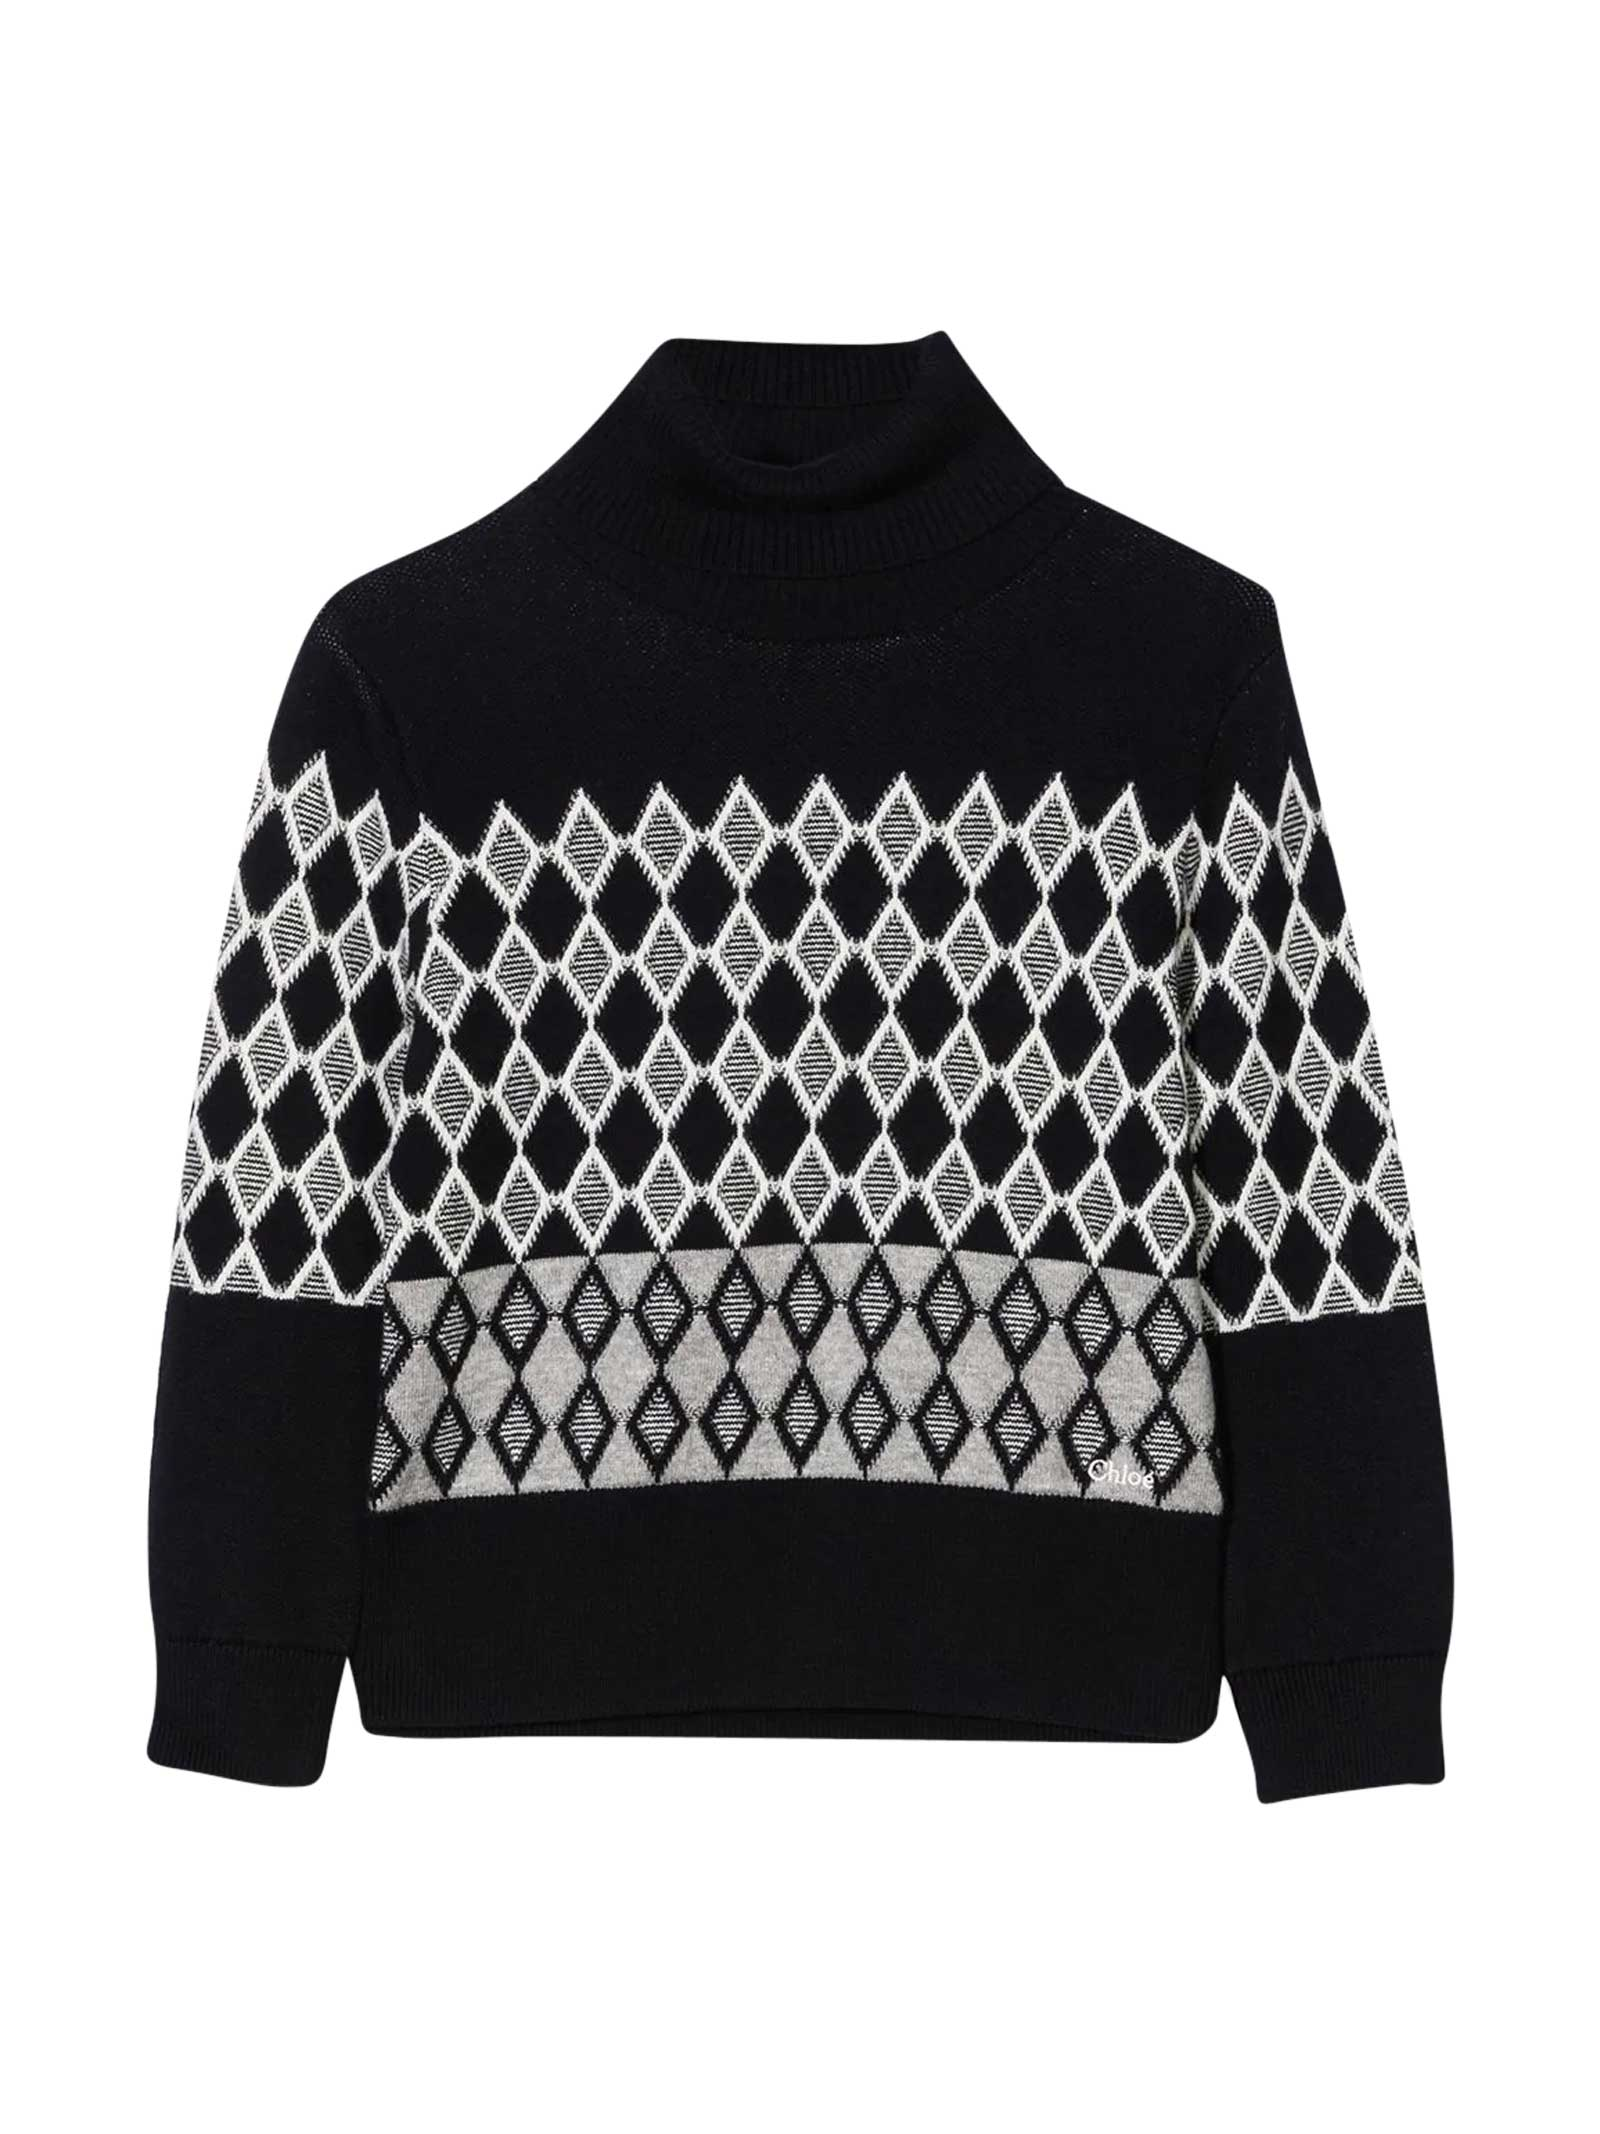 Marine diamond knit sweater teen Chloé kids with roll neck. Cotone 90%, Lana 10%